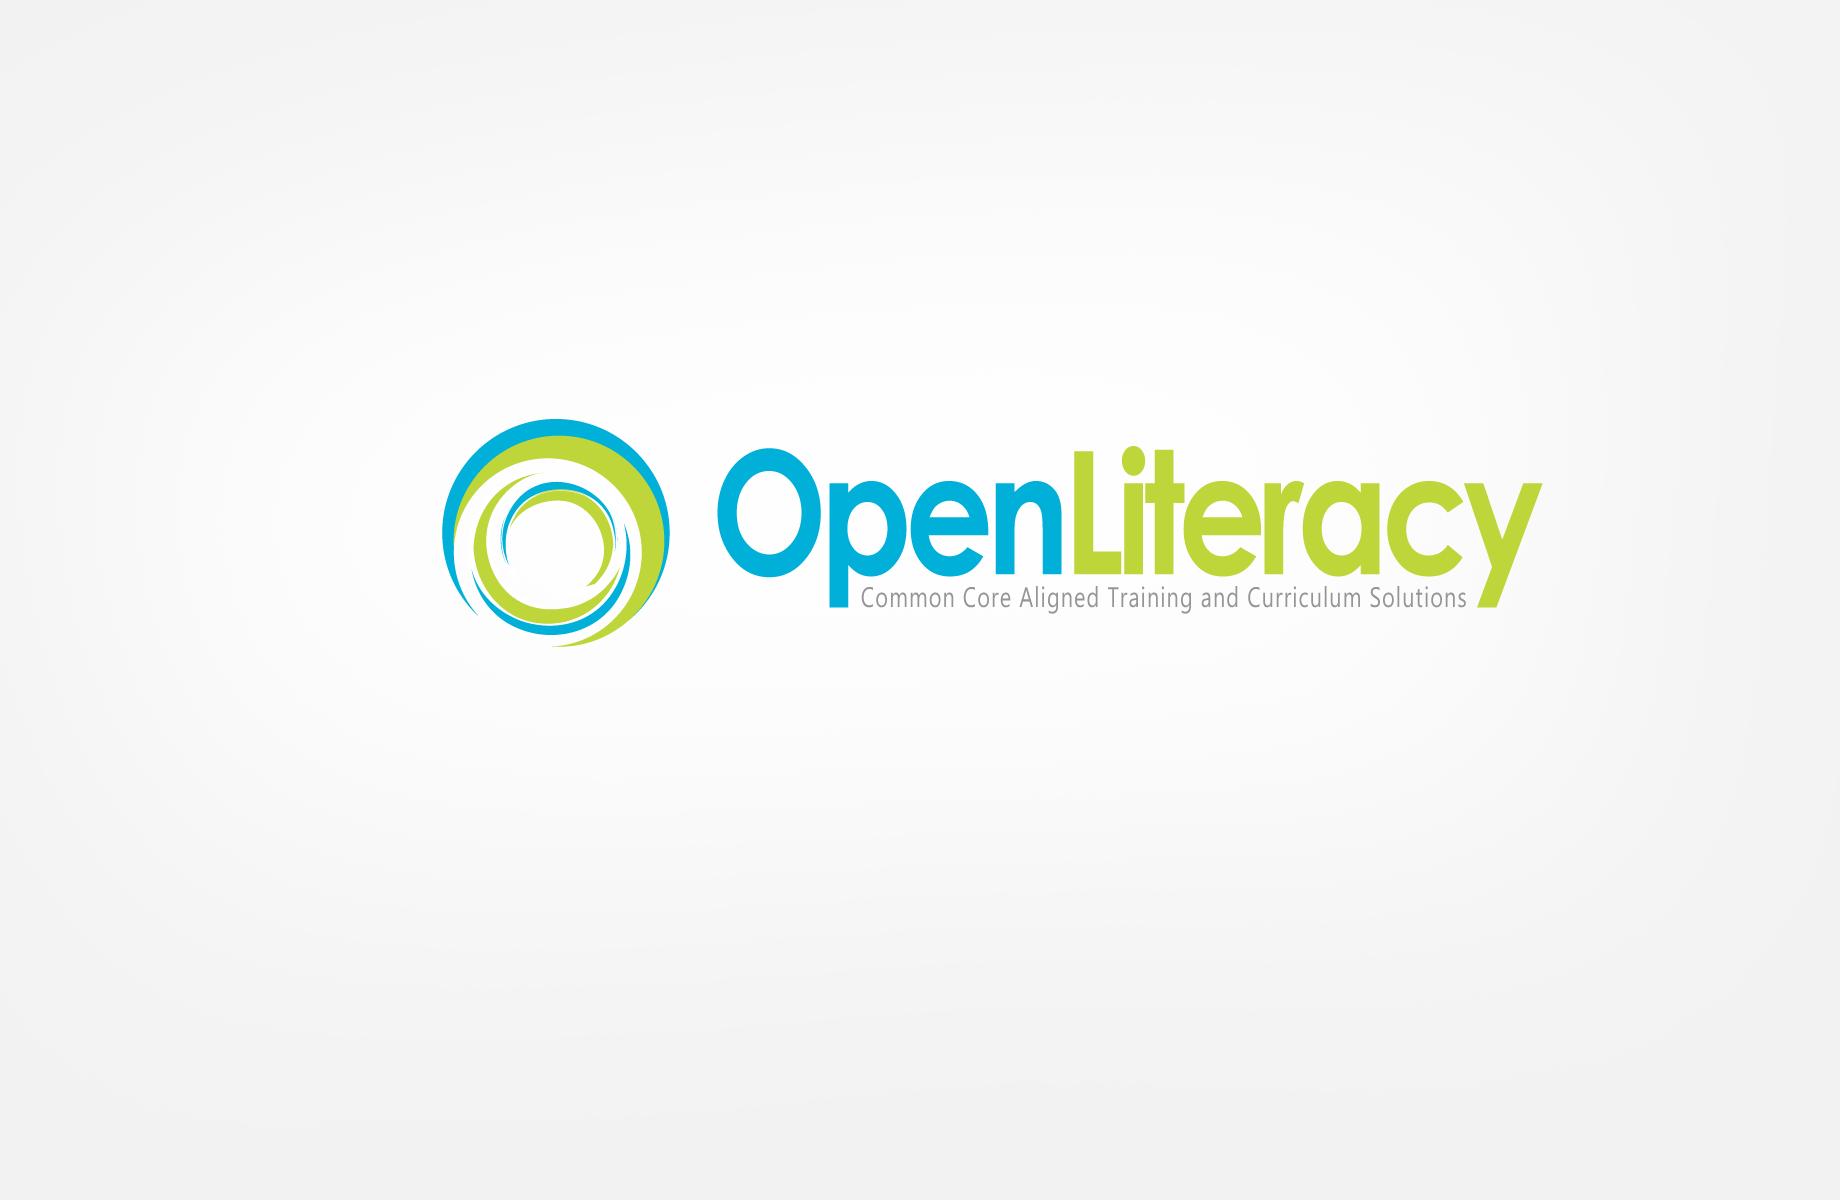 Logo Design by Jan Chua - Entry No. 34 in the Logo Design Contest Inspiring Logo Design for OpenLiteracy.